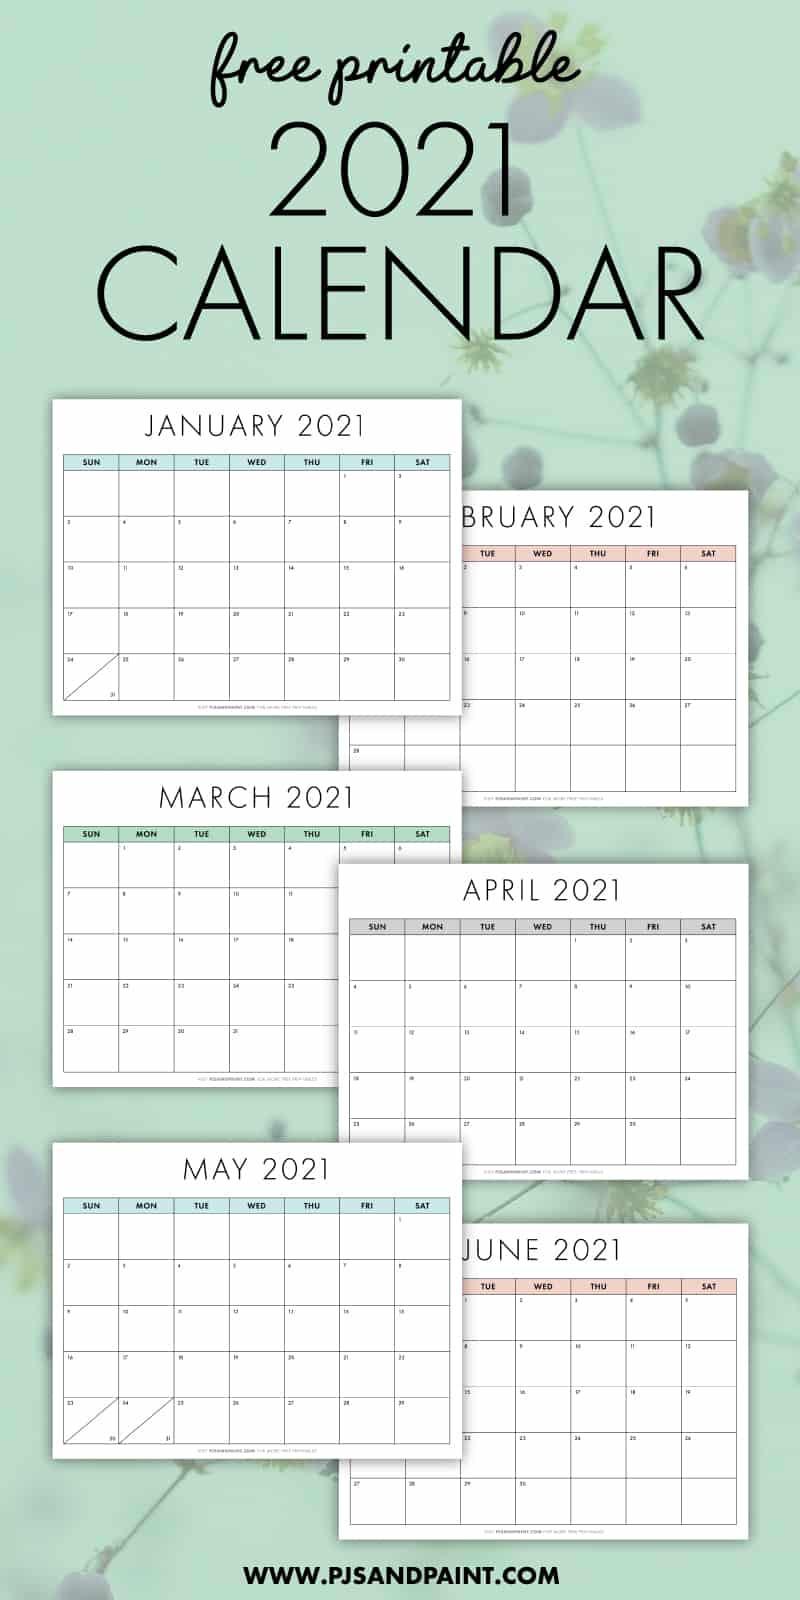 Free Printable 2021 Calendar - Sunday Start - Pjs And Paint  2021 2021 Monthly Calendar Printable Free